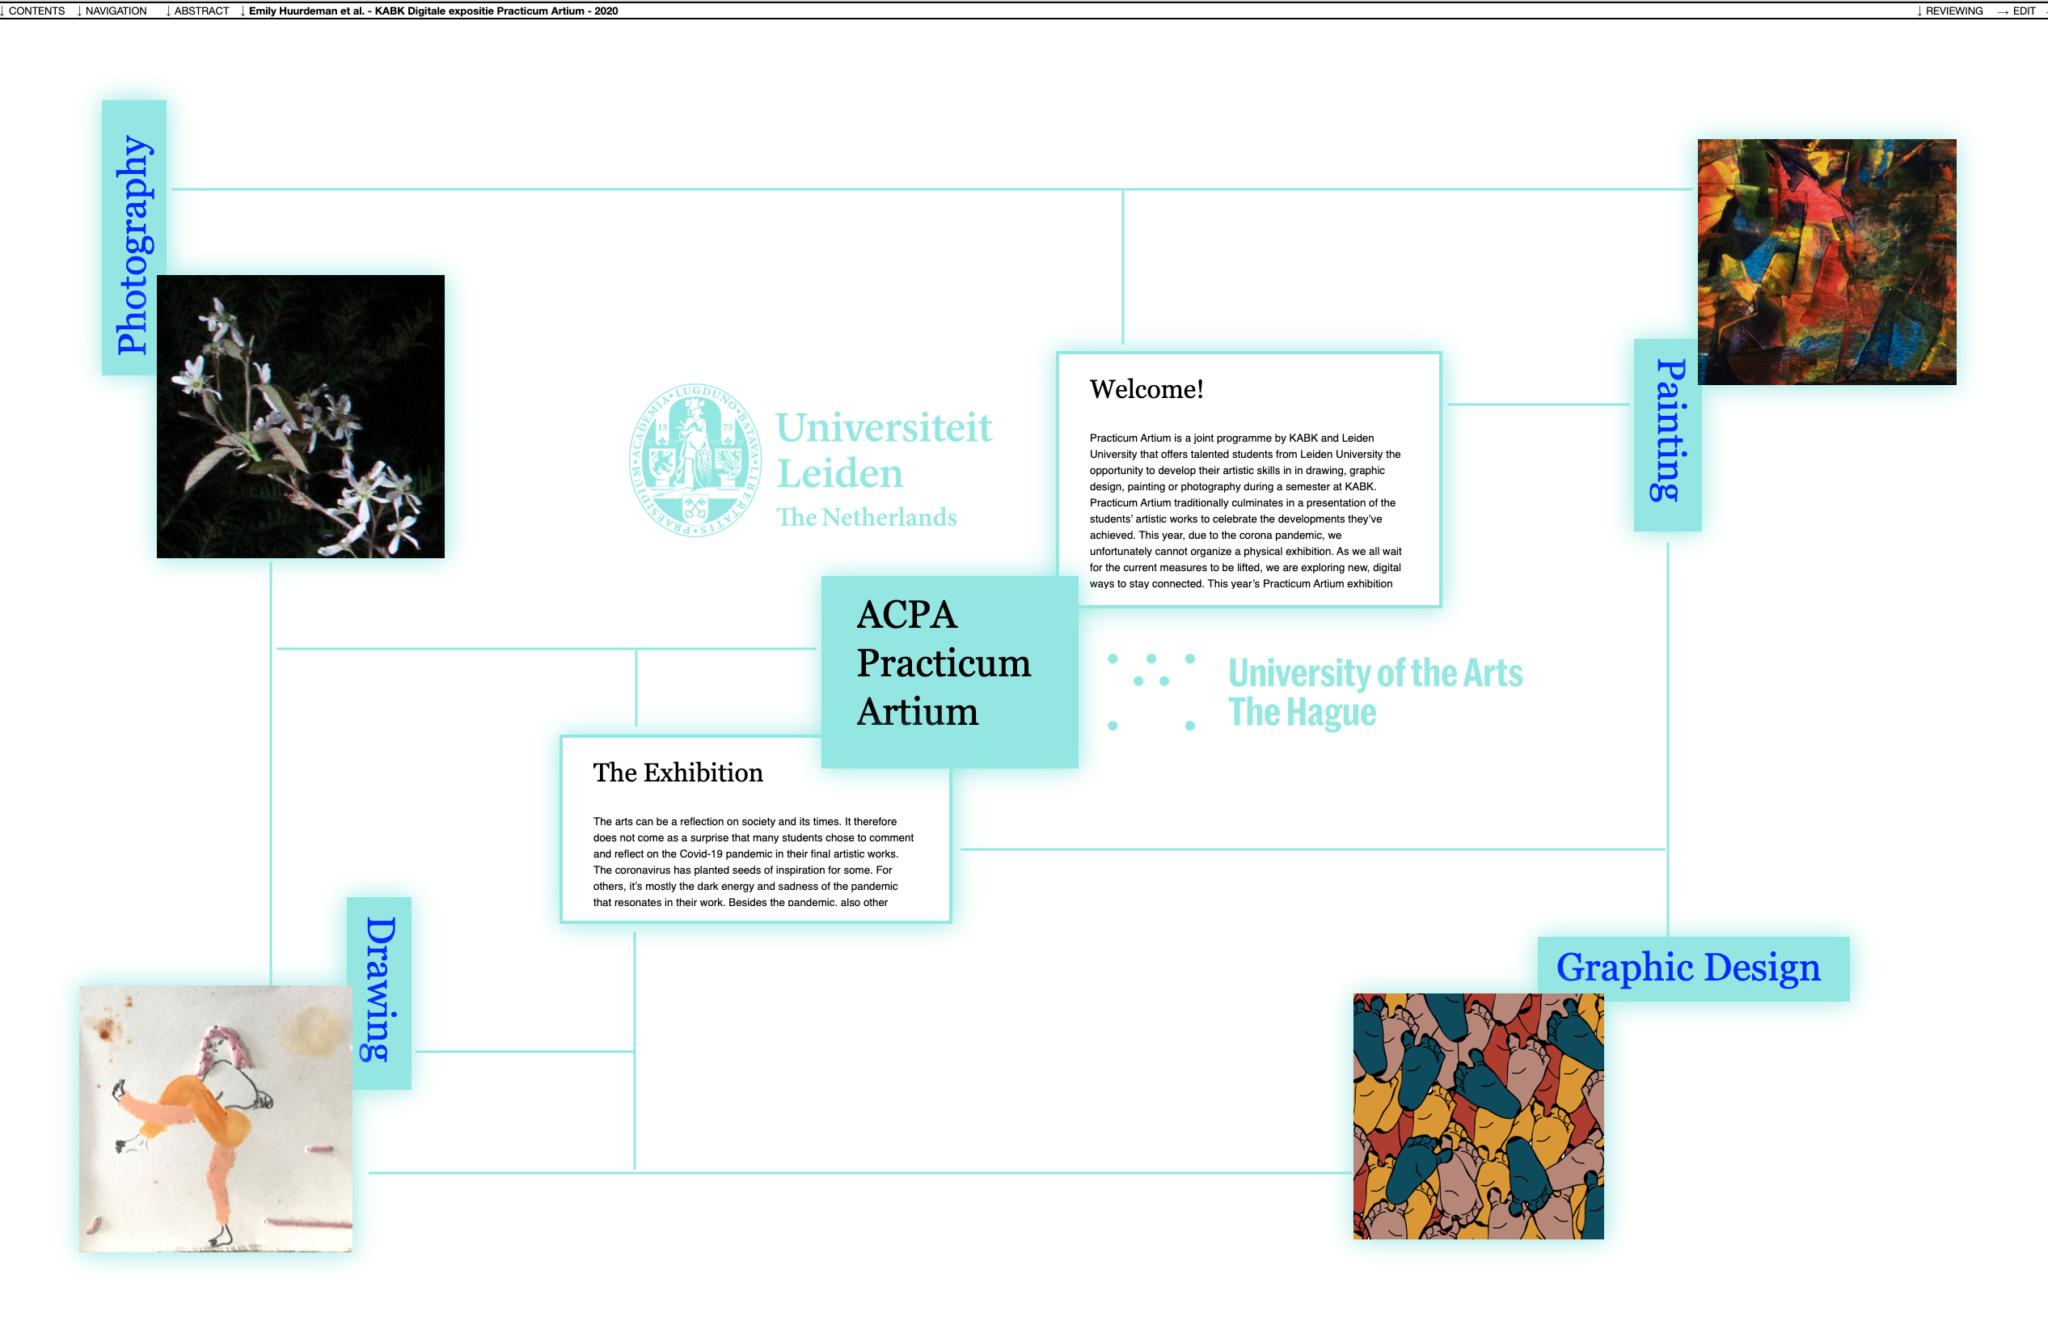 Screenshot online exhibition Practicum Artium